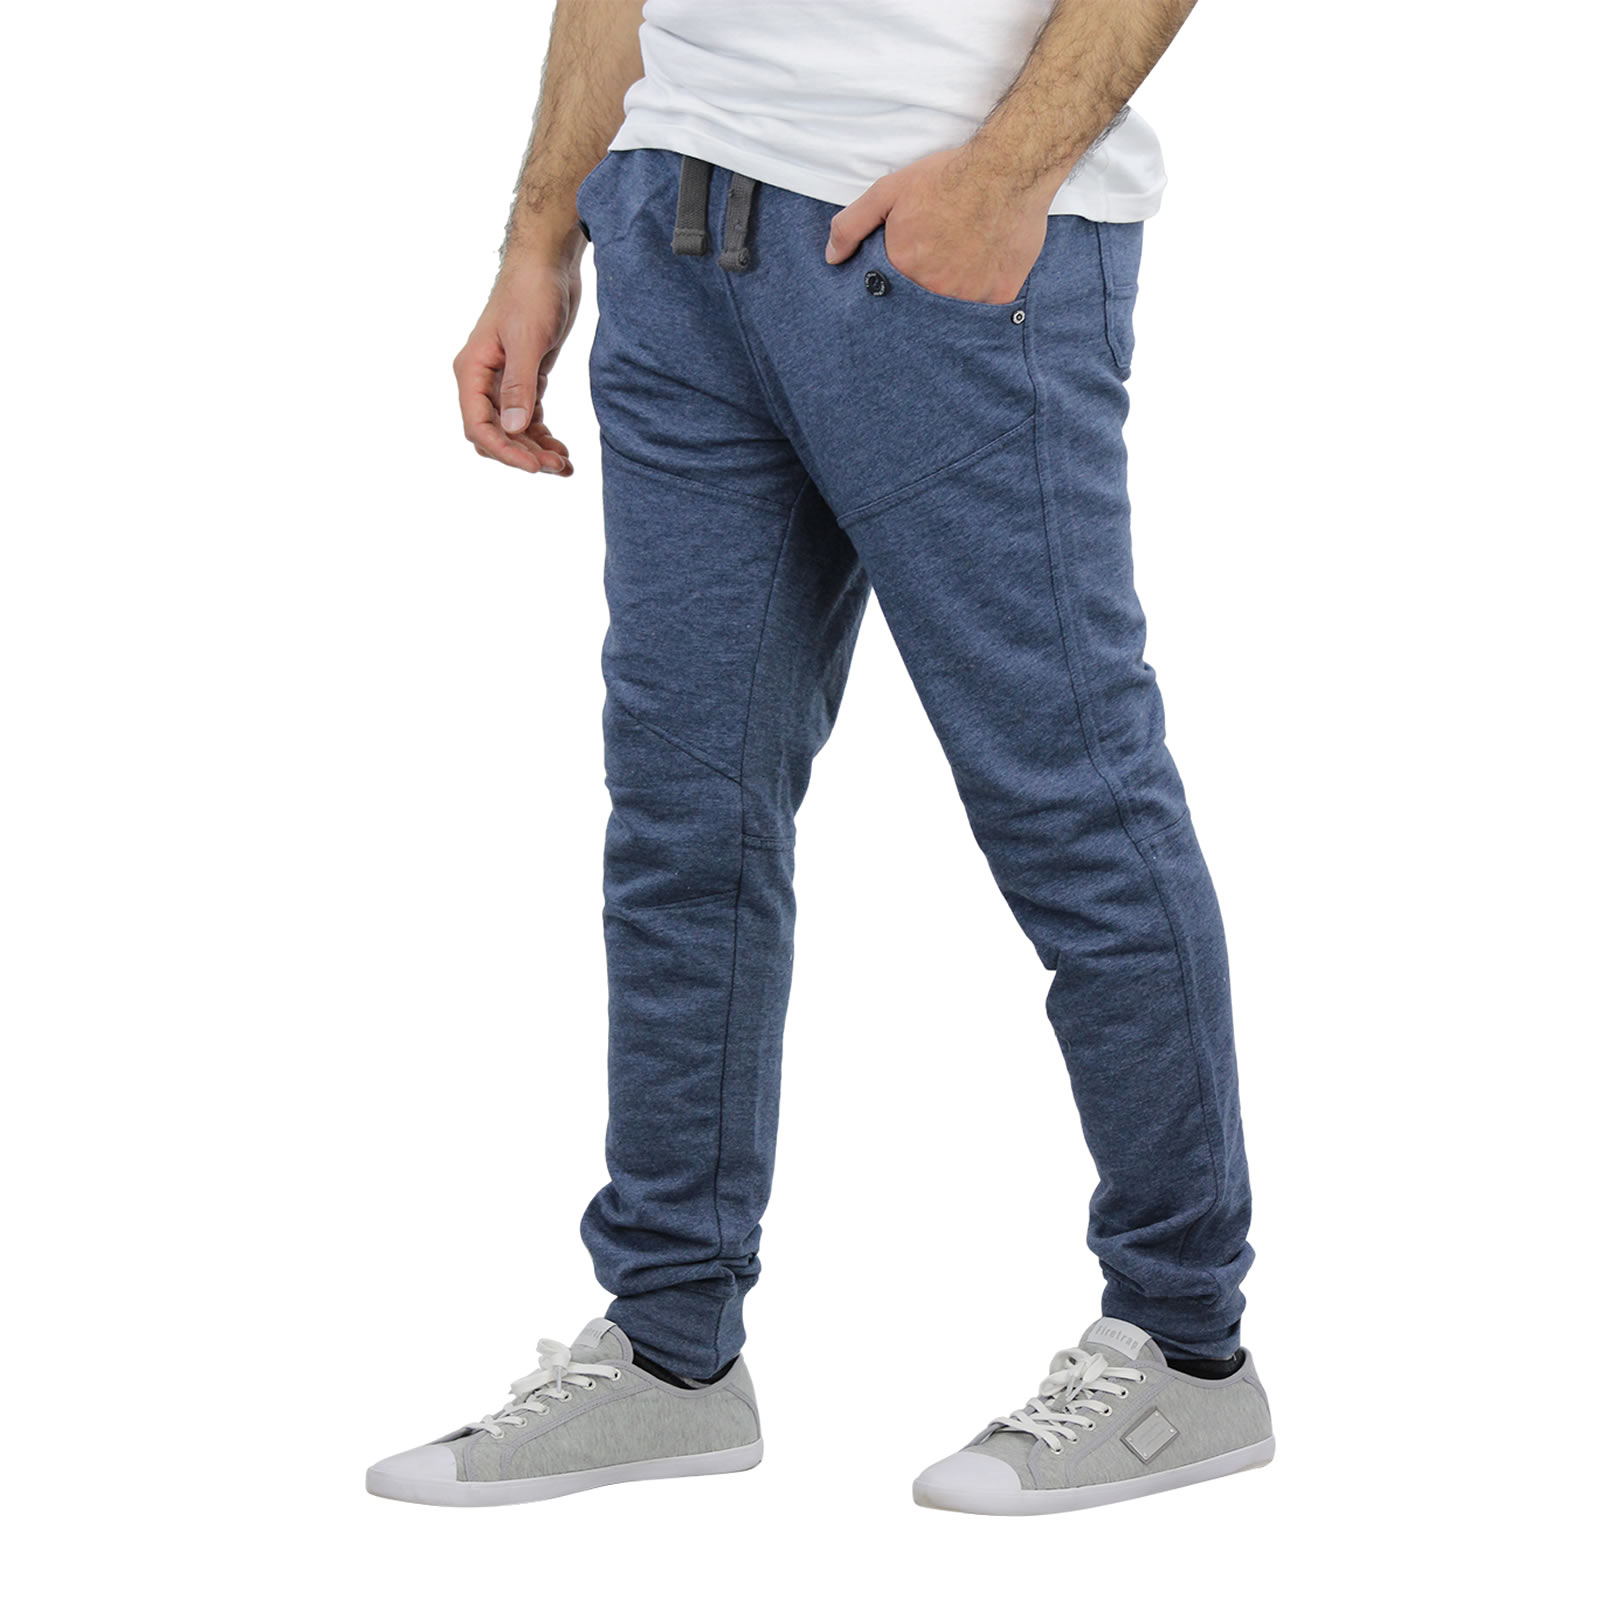 Mens Joggers Firetrap Christchurch Skinny Slim Fit Casual ...